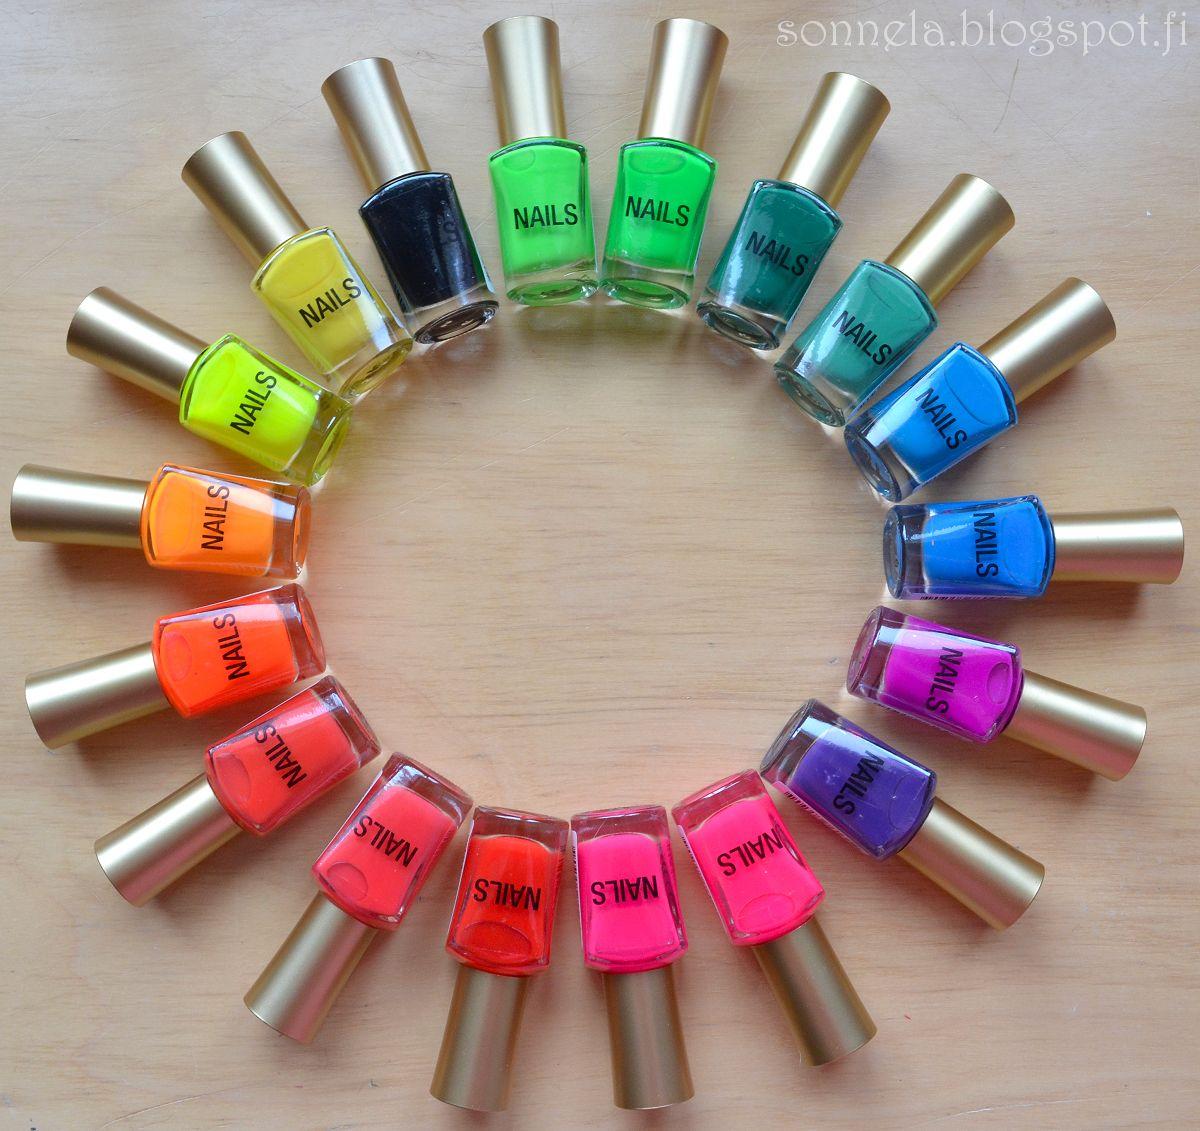 I ♡ nail polish